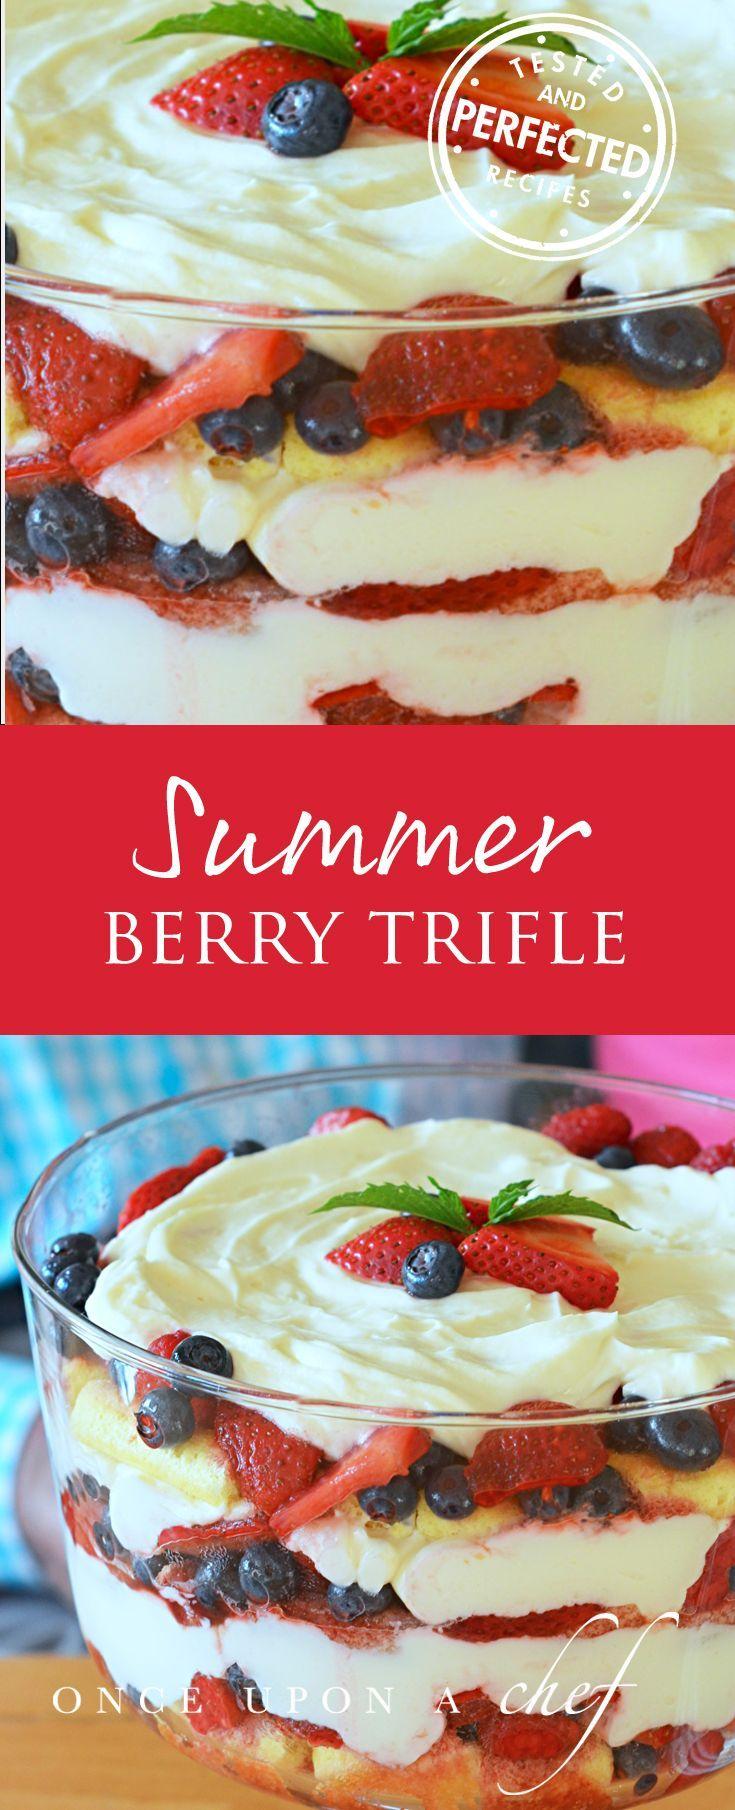 Best Summer Berry Trifle  Use gluten free pound cake or lemon muffins